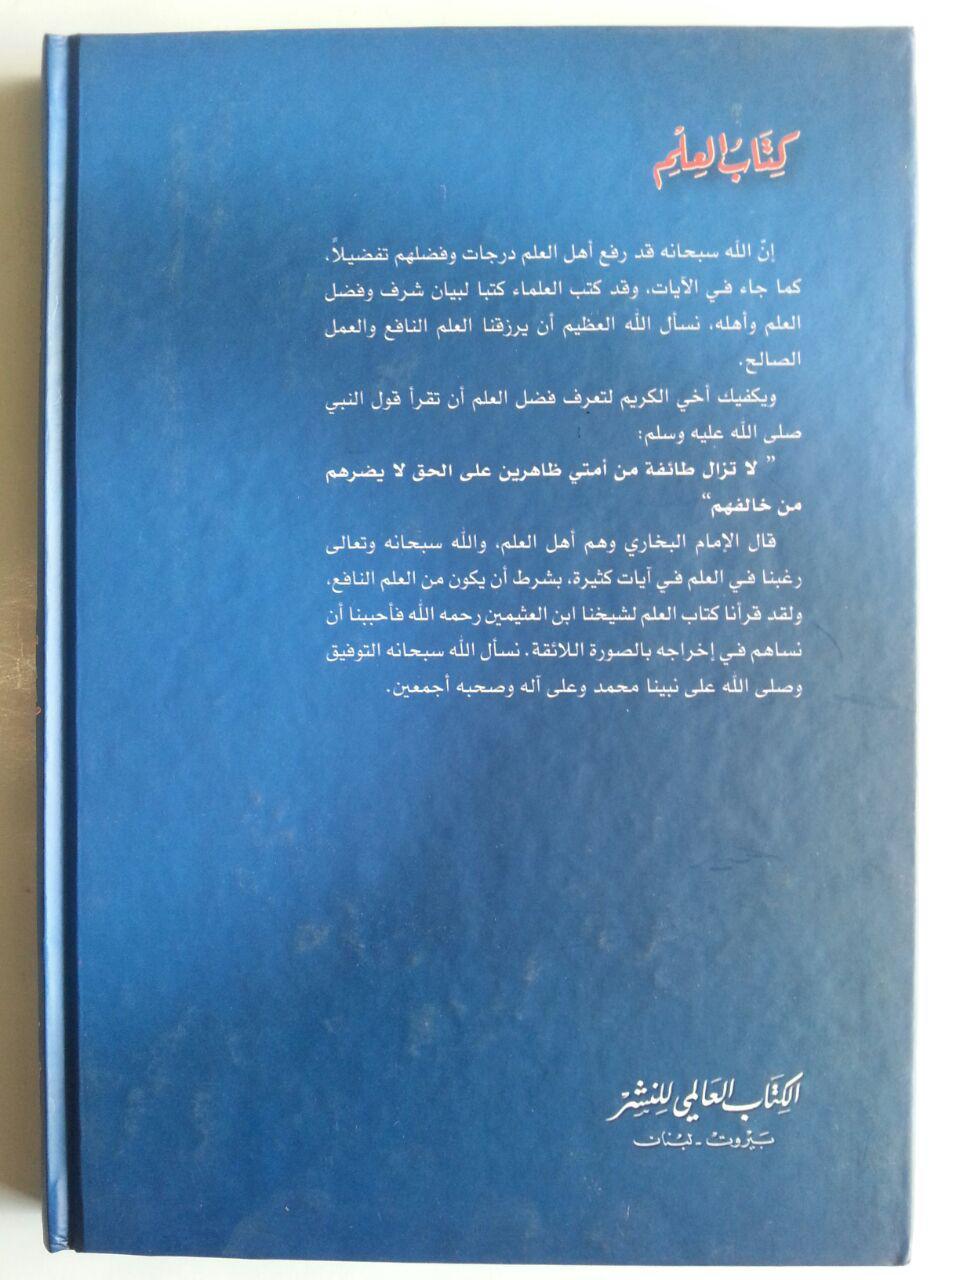 Kitab Kitabul Ilmi Syaikh Utsaimin cover